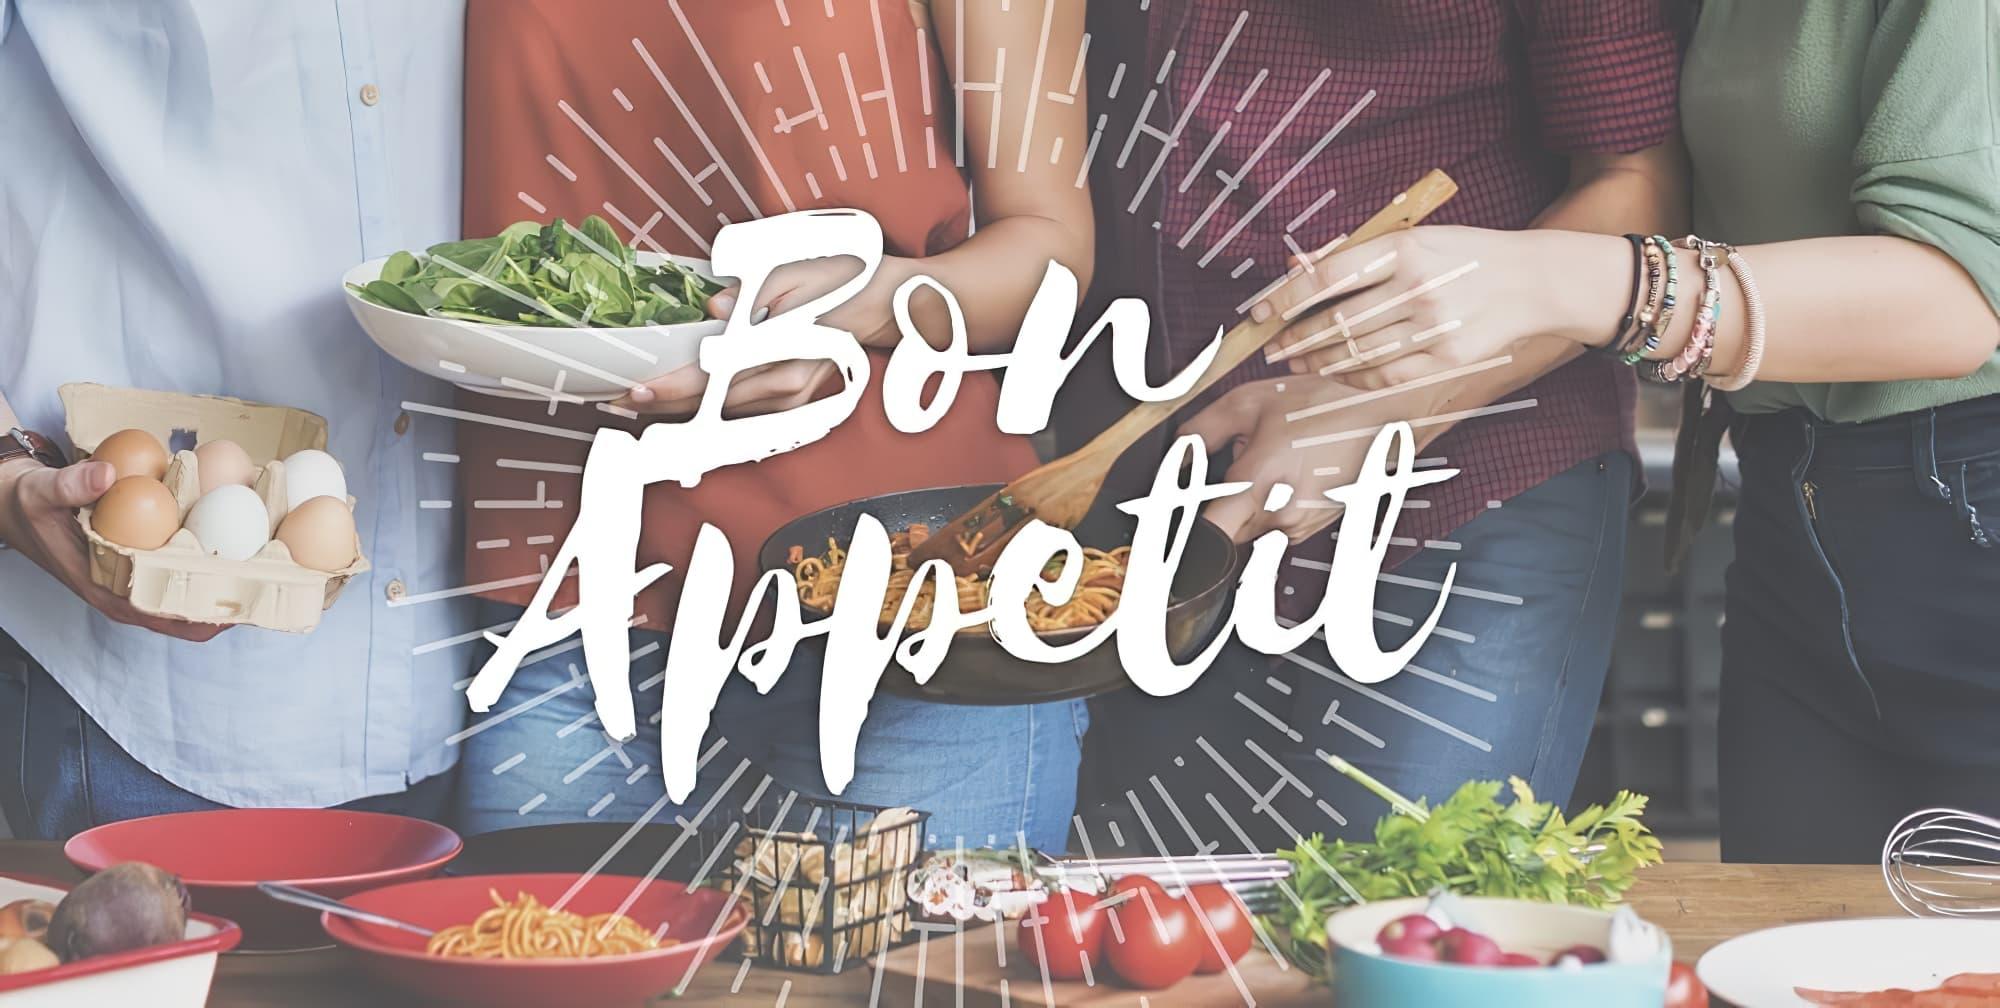 https://cdn.generationvoyage.fr/2020/03/bon-appetit-plusieurs-langues.jpg